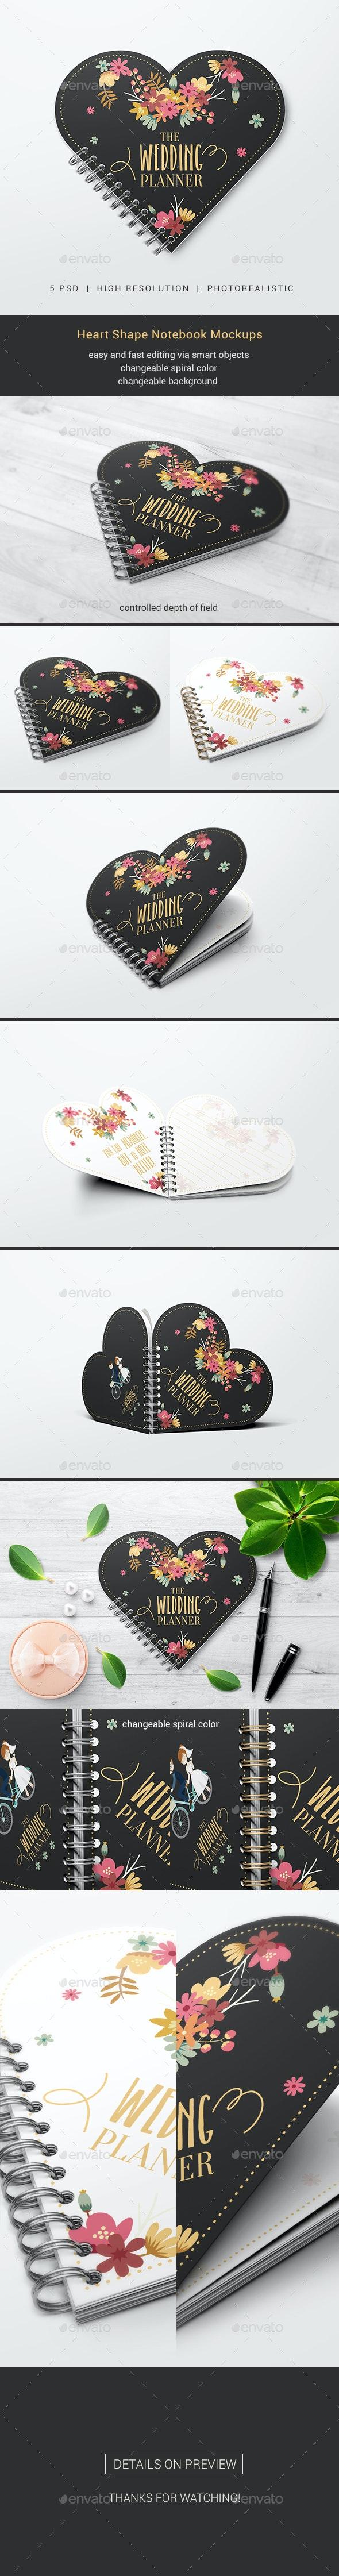 Heart Shape Notebook Mockups - Miscellaneous Print